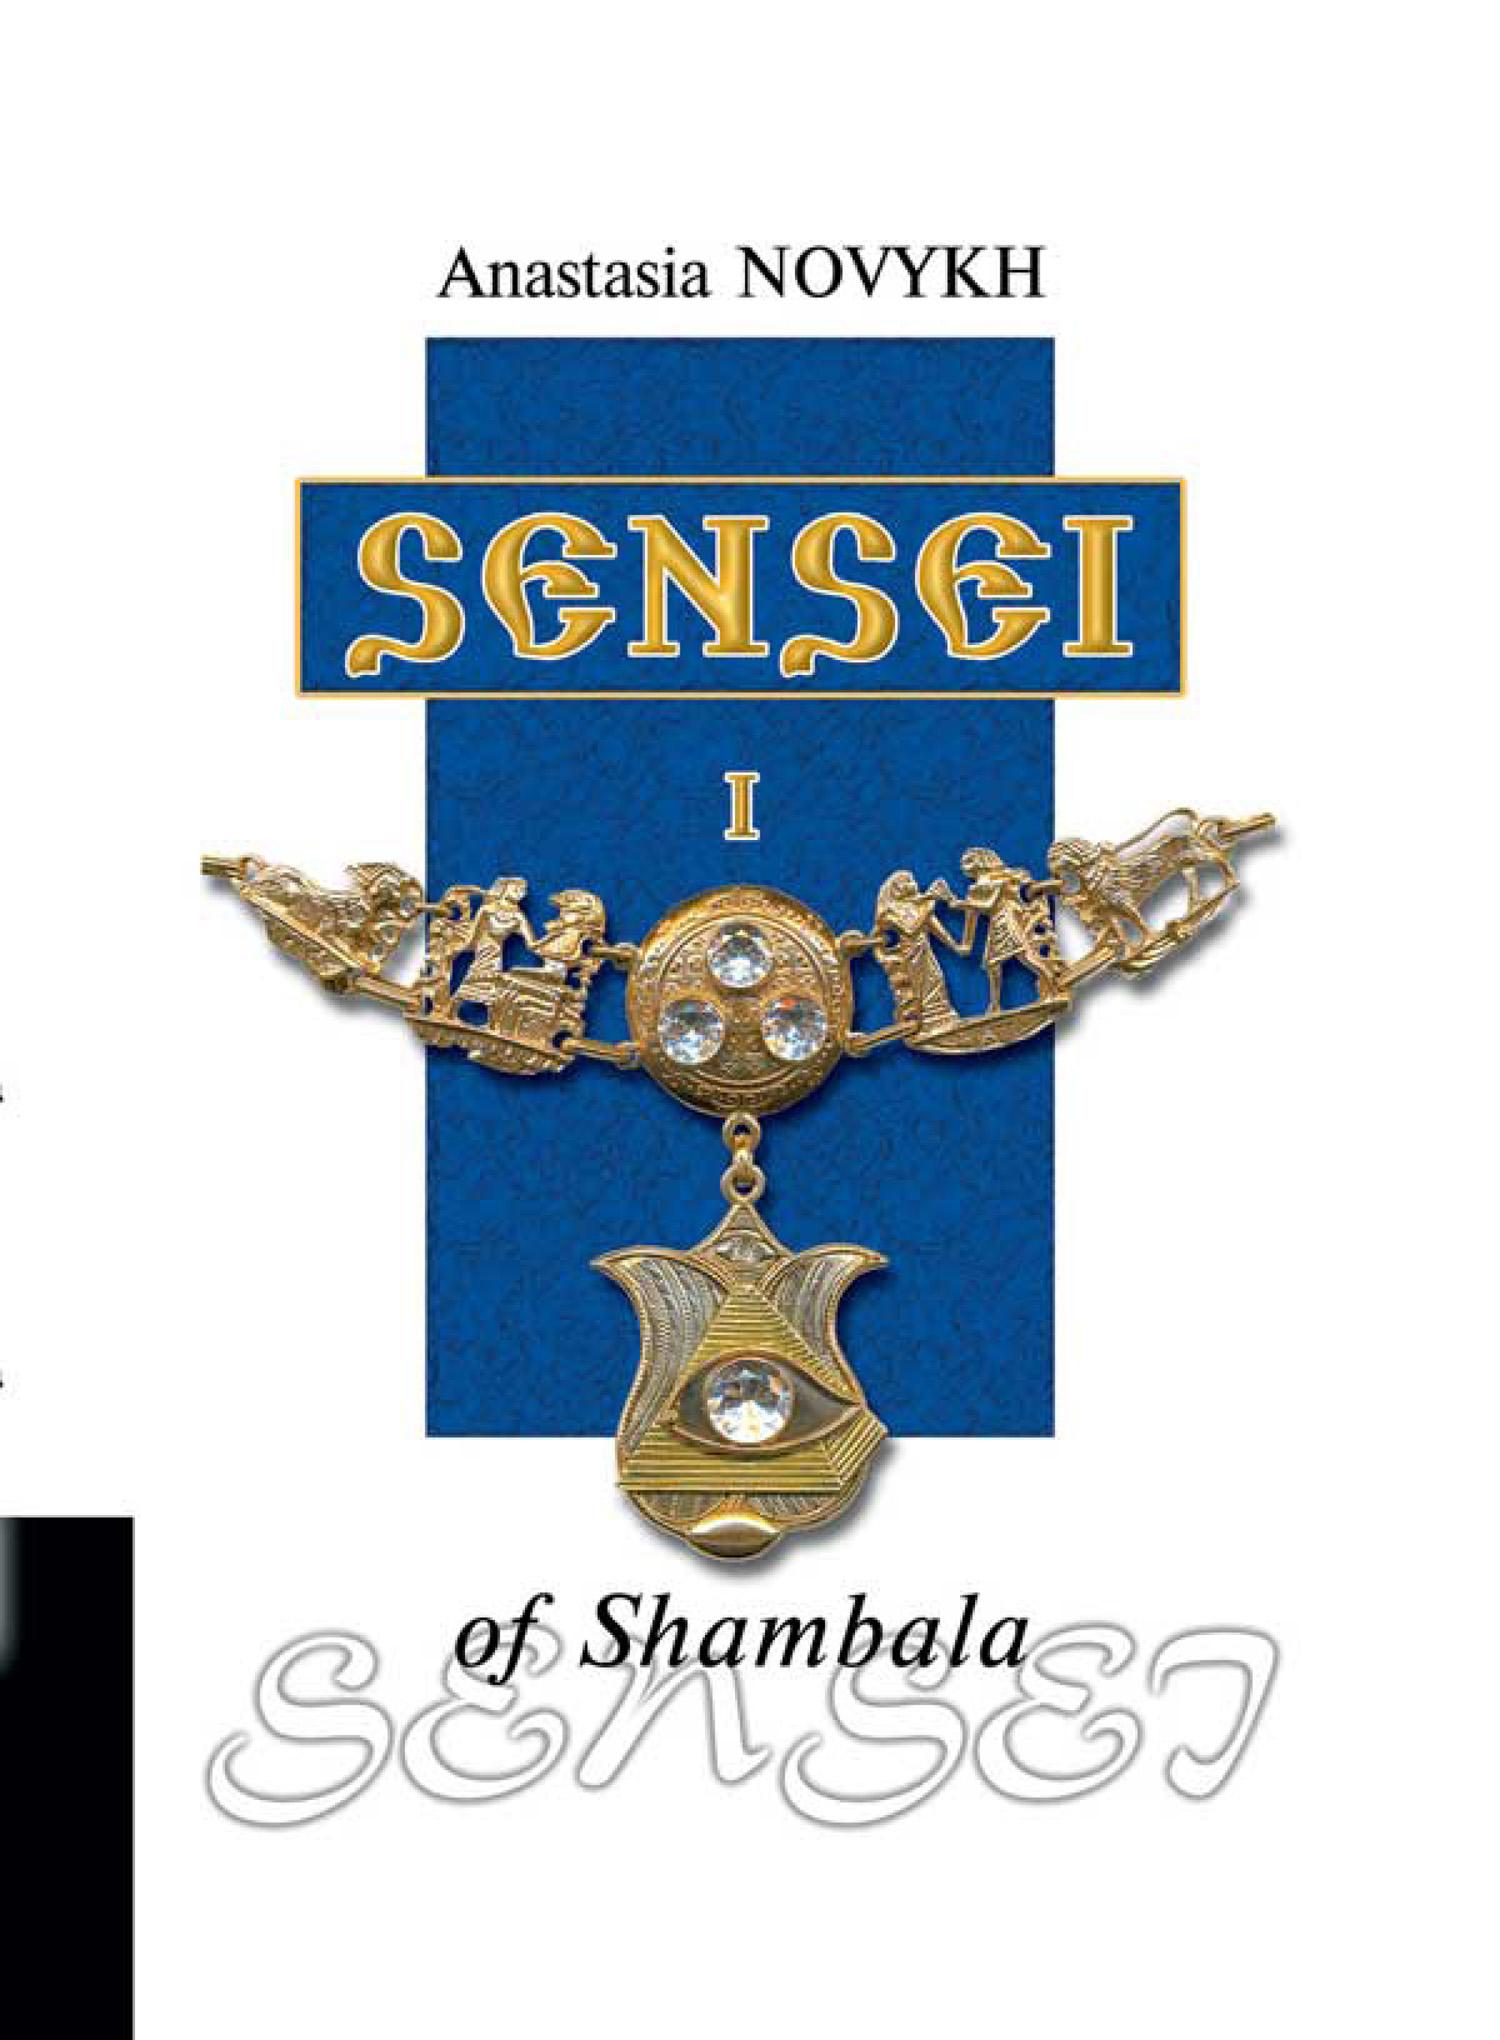 Anastasia Novykh Sensei of Shambala anastasia novykh sensei of shambala book iv isbn 978 966 2296 13 6